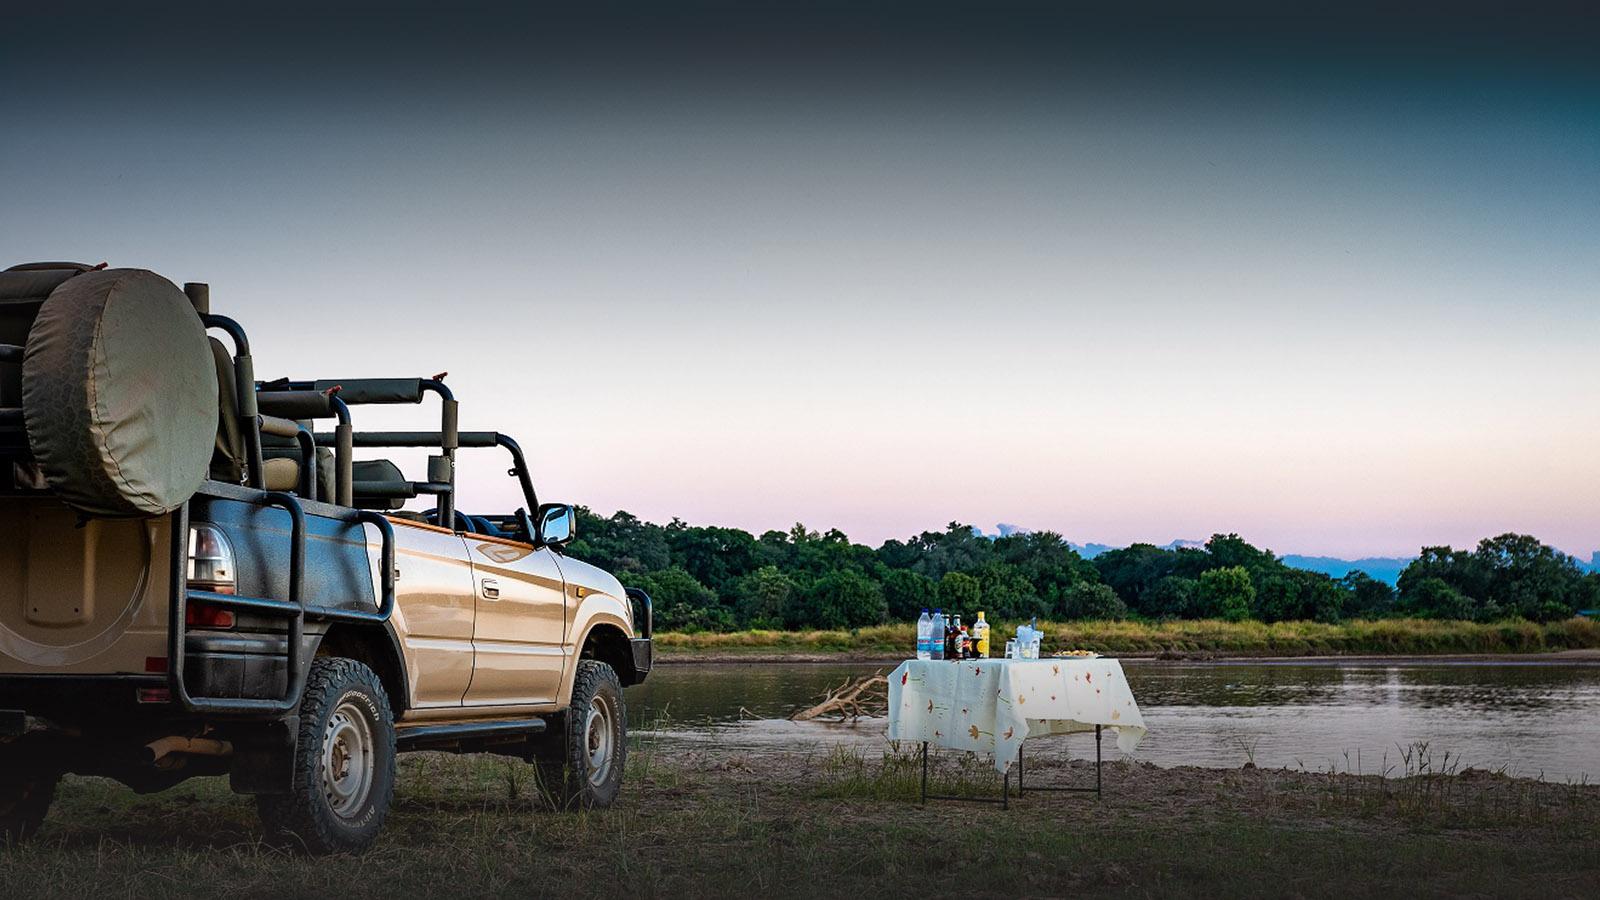 thornicroft lodge south-luangwa-mfuwe-area-zambia-in-style-good-value-safari-sundowner-drinks